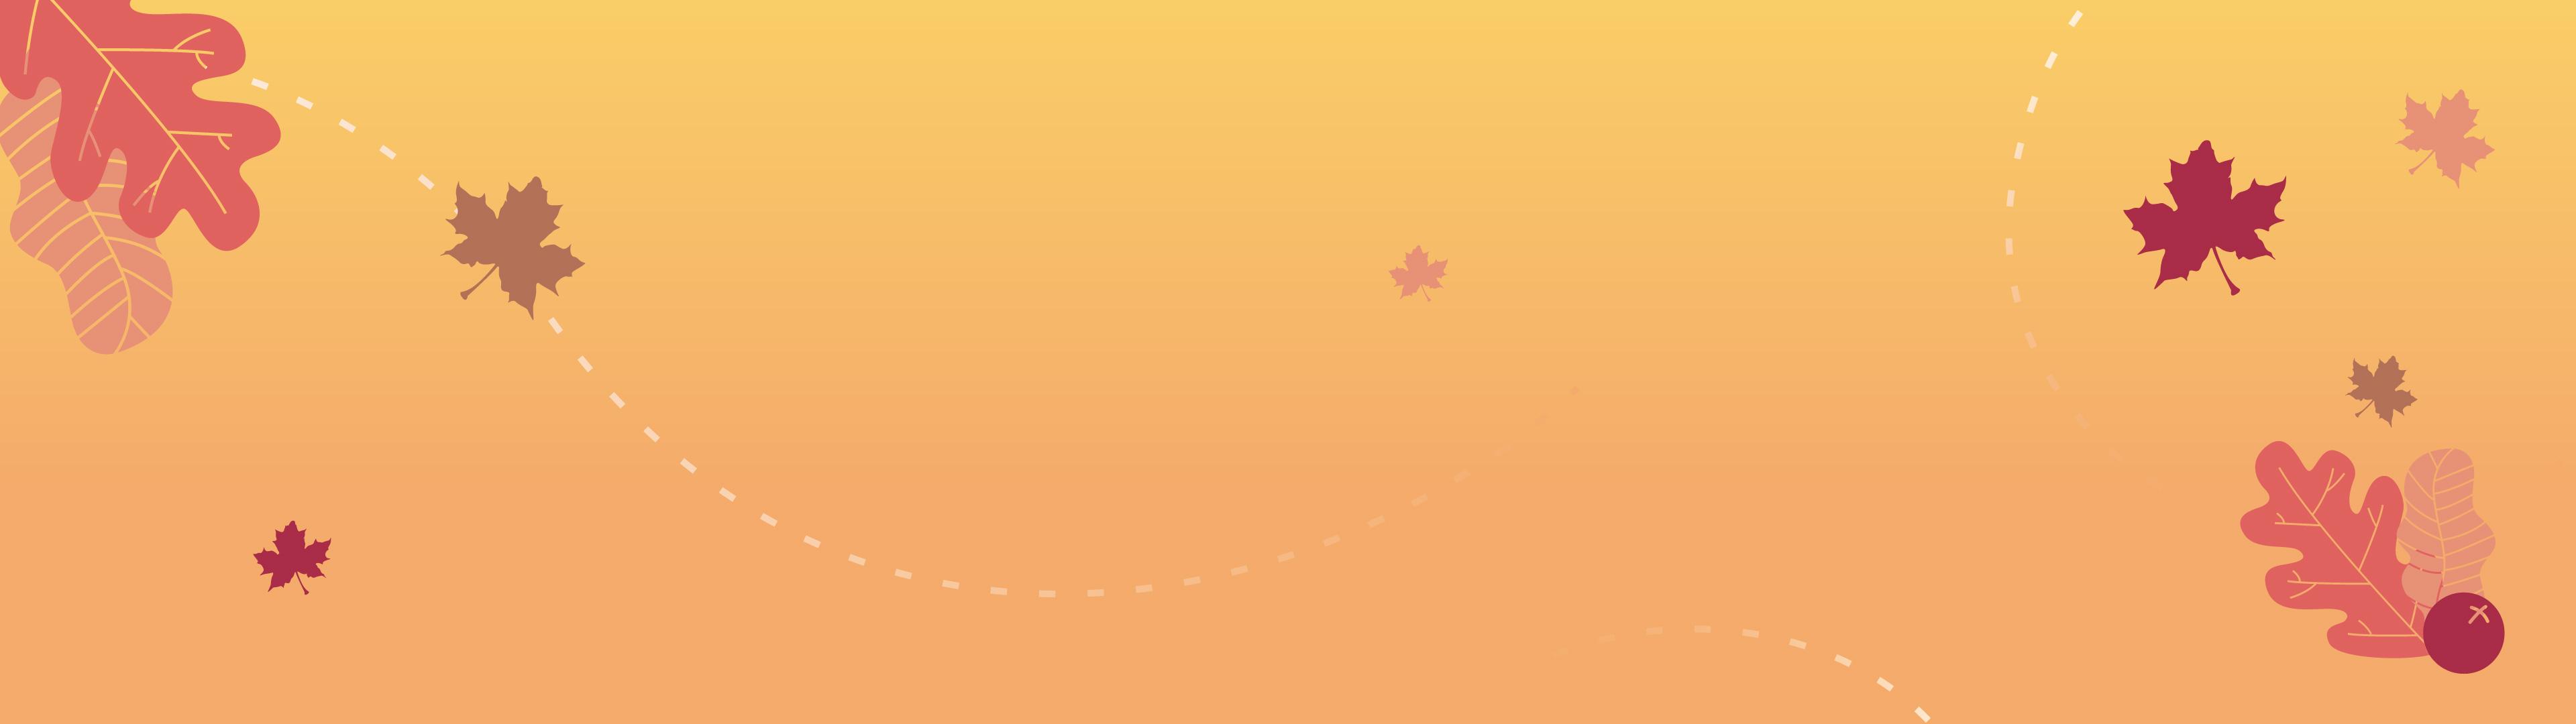 Orange banner with fall leaf illustrations